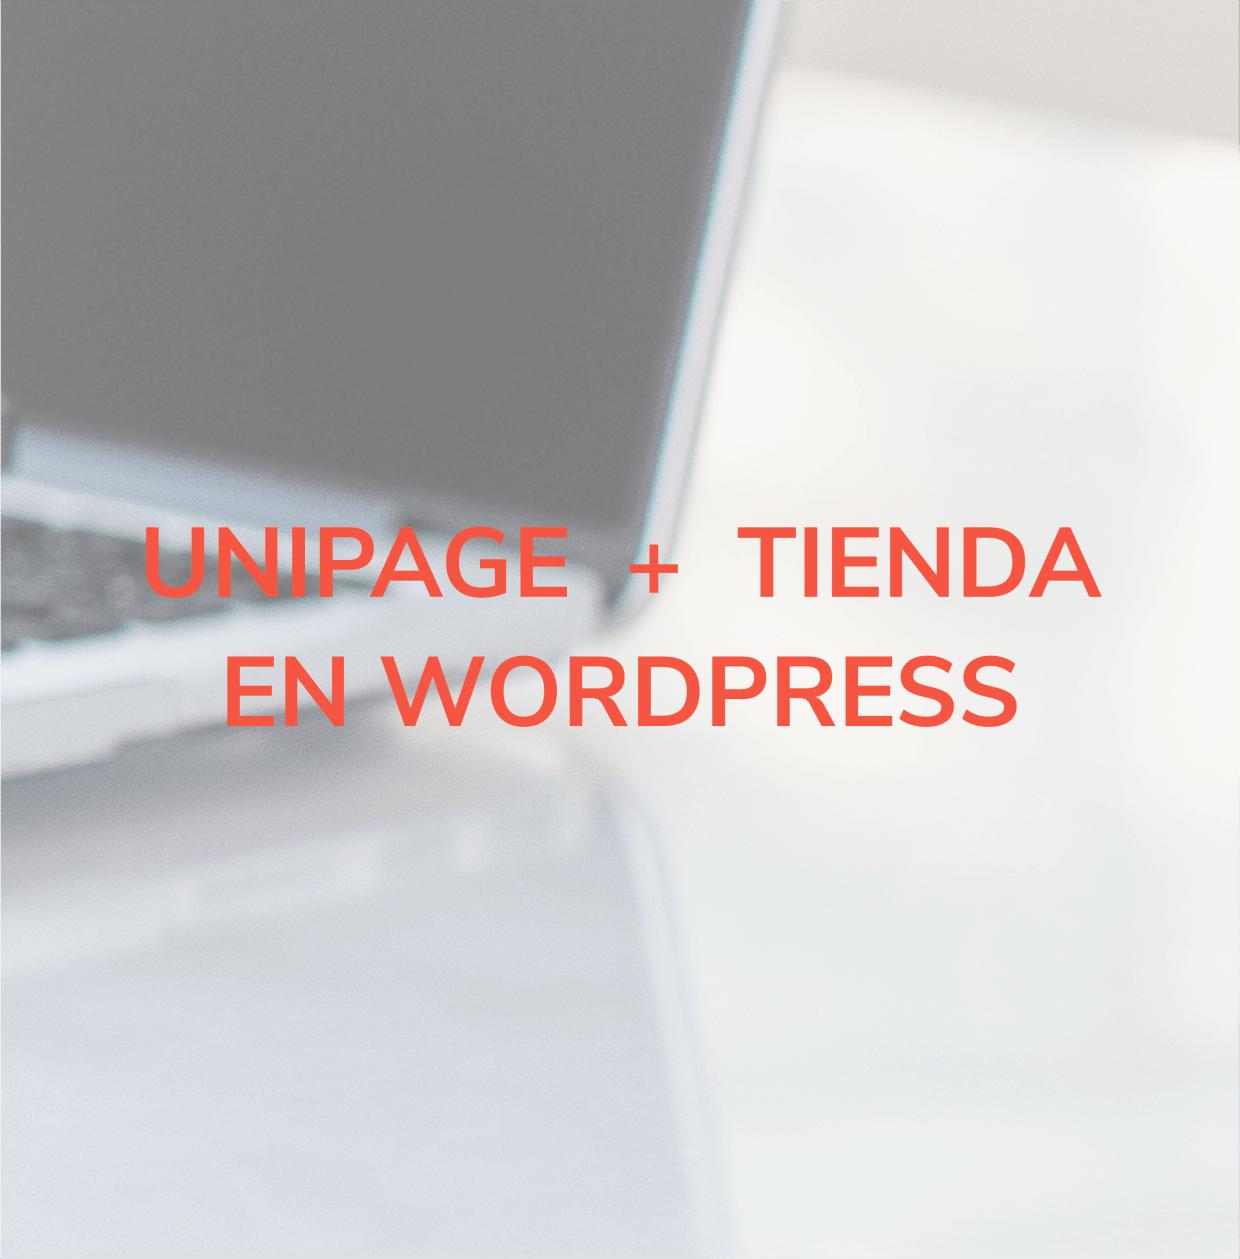 Web tipo Unipage + tienda